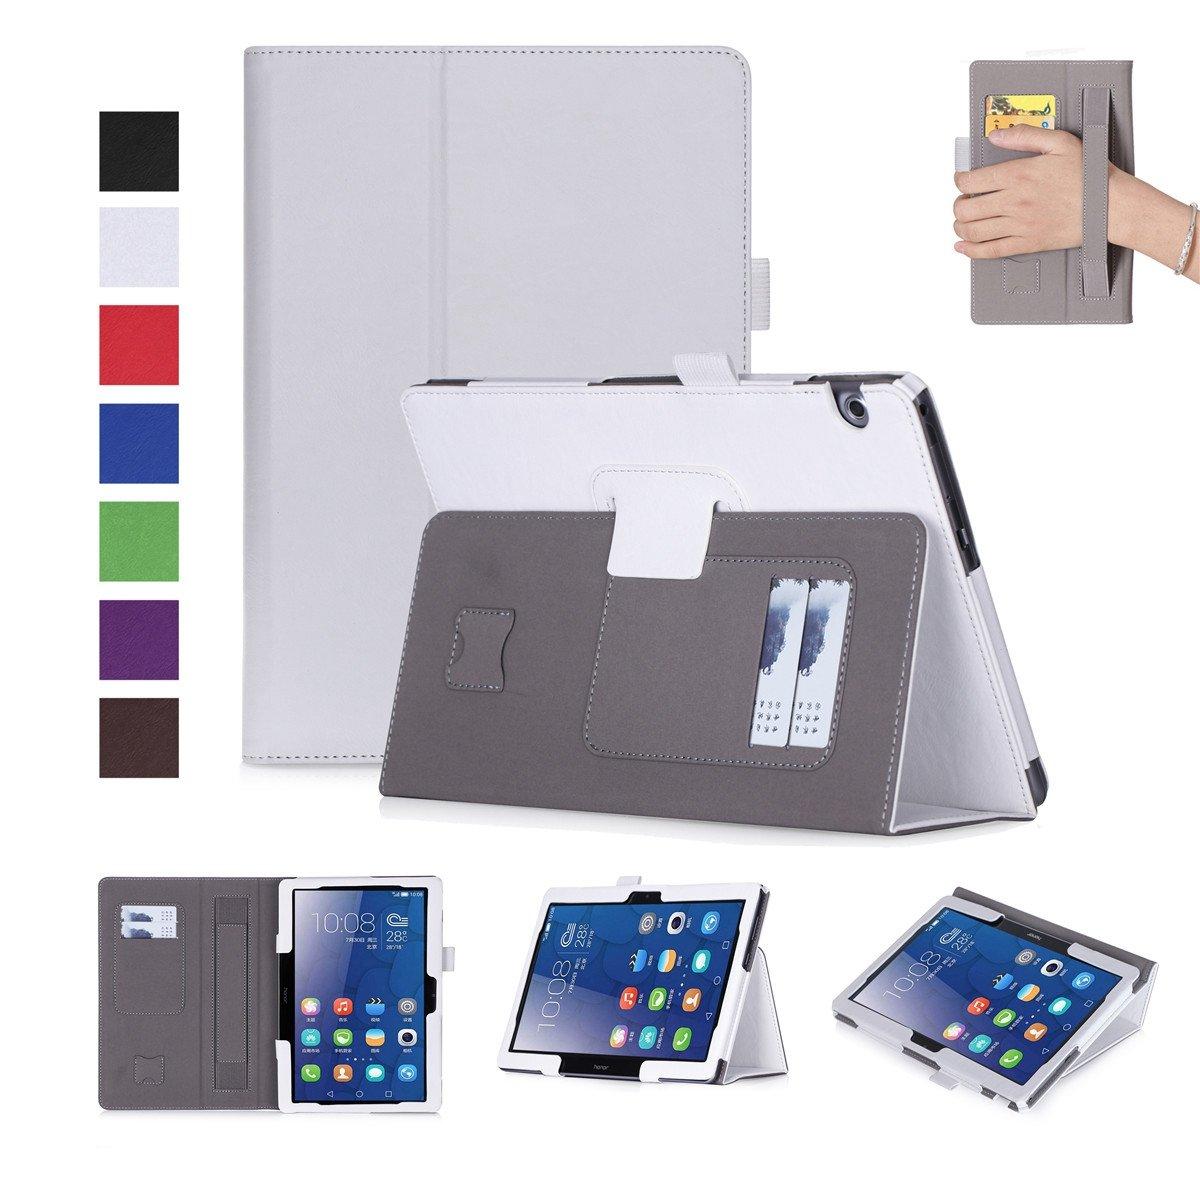 Huawei MediaPad T3 10.0プレミアムPUレザー フリップケース B07MY3WV3L Casefirst ホワイト T3 9U15-90-786 9U15-90-786 ホワイト B07MY3WV3L, 小笠町:c10207dd --- m2cweb.com